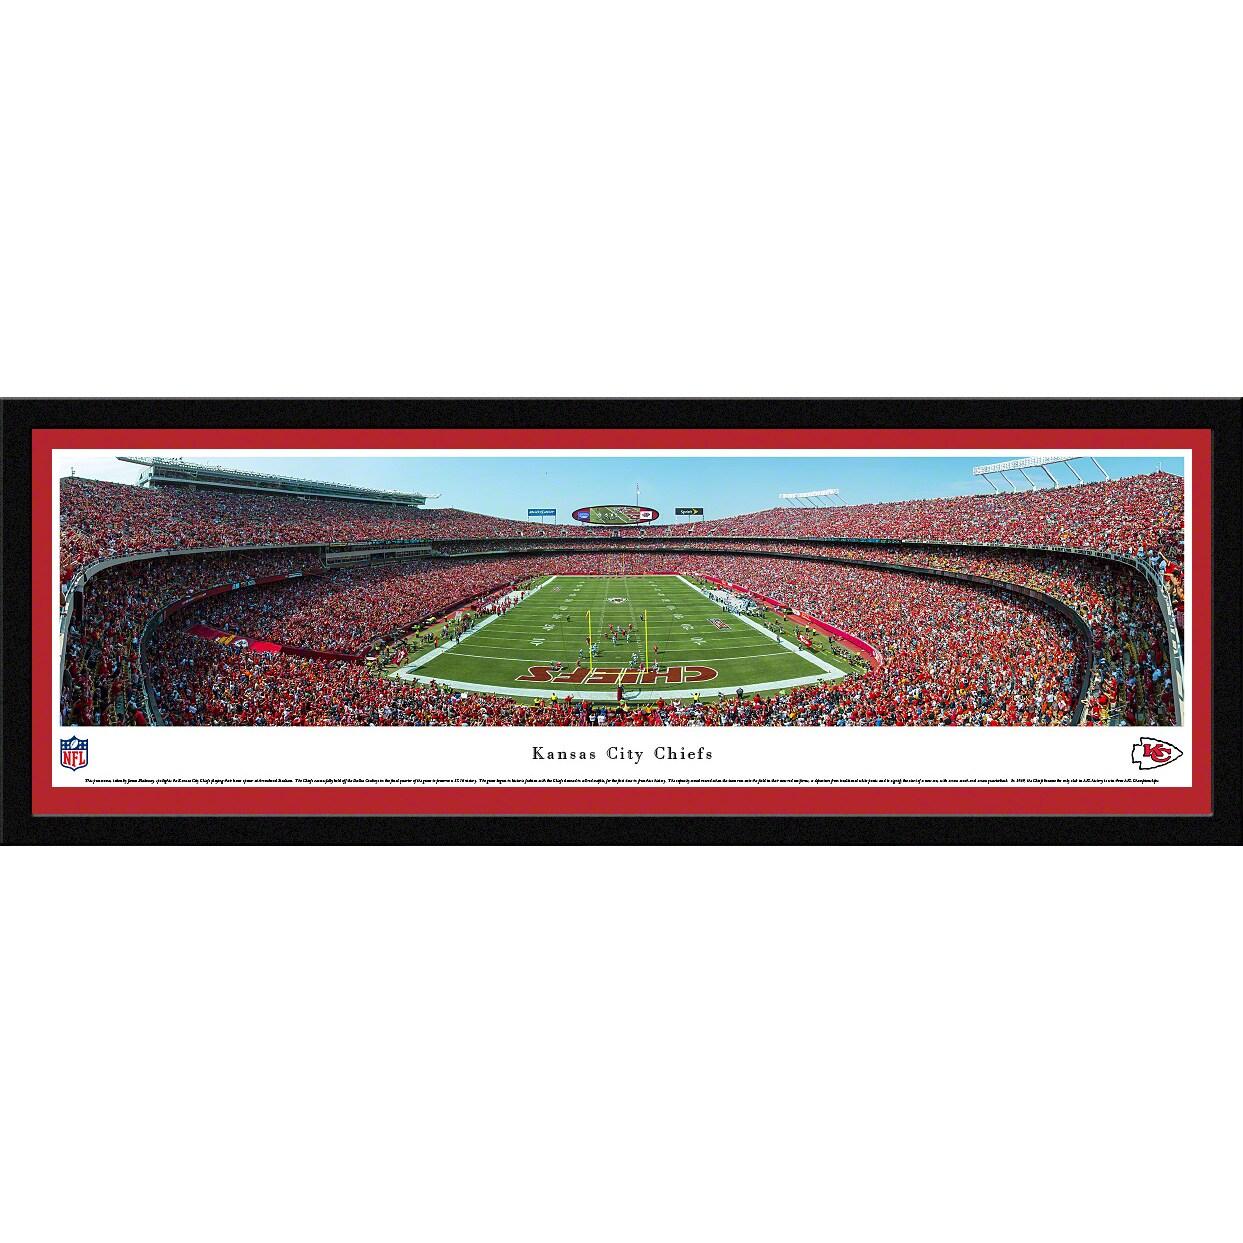 "Kansas City Chiefs 16"" x 42"" Select Frame Panoramic Photo"